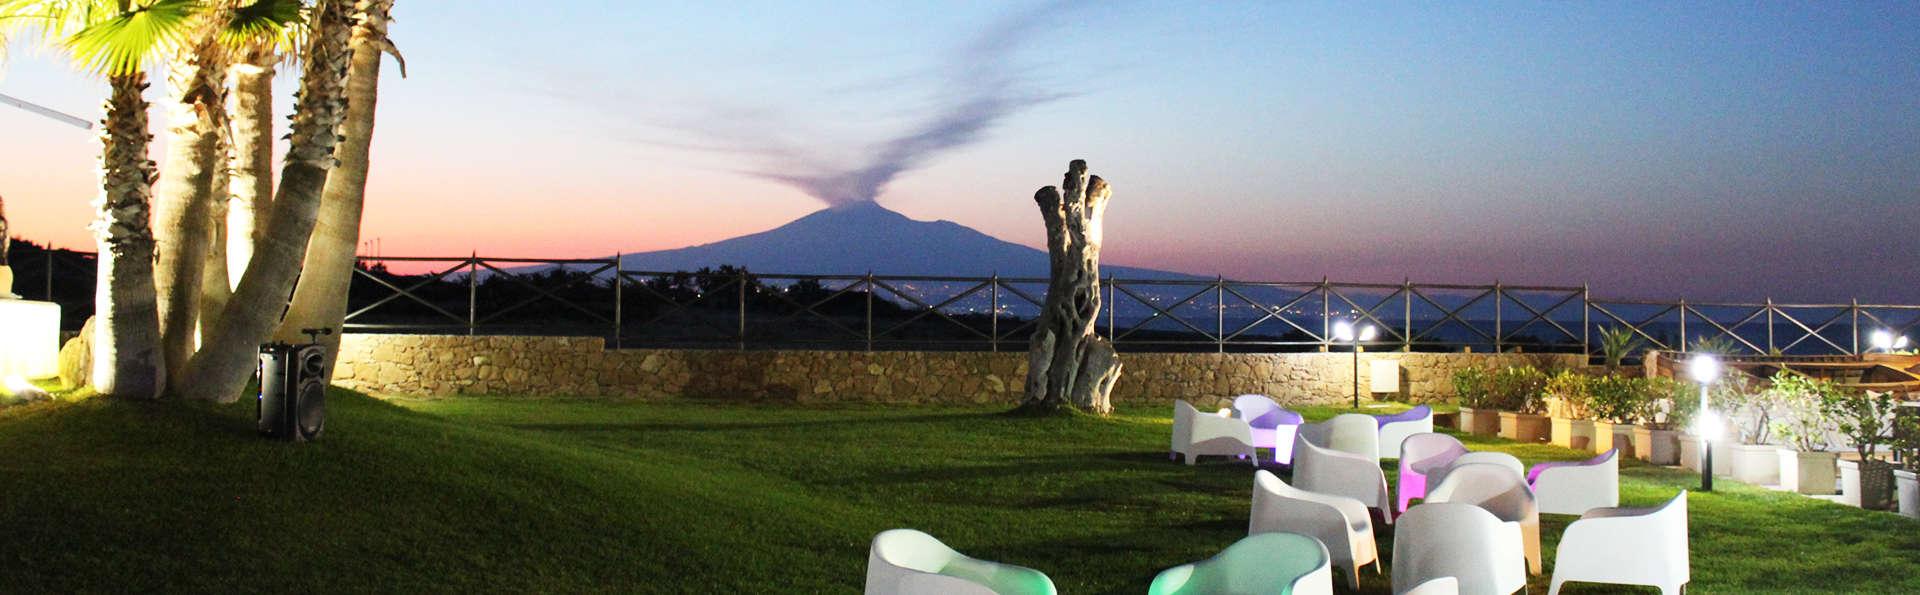 Hotel Residence Capo Campolato - edit_terrace1.jpg